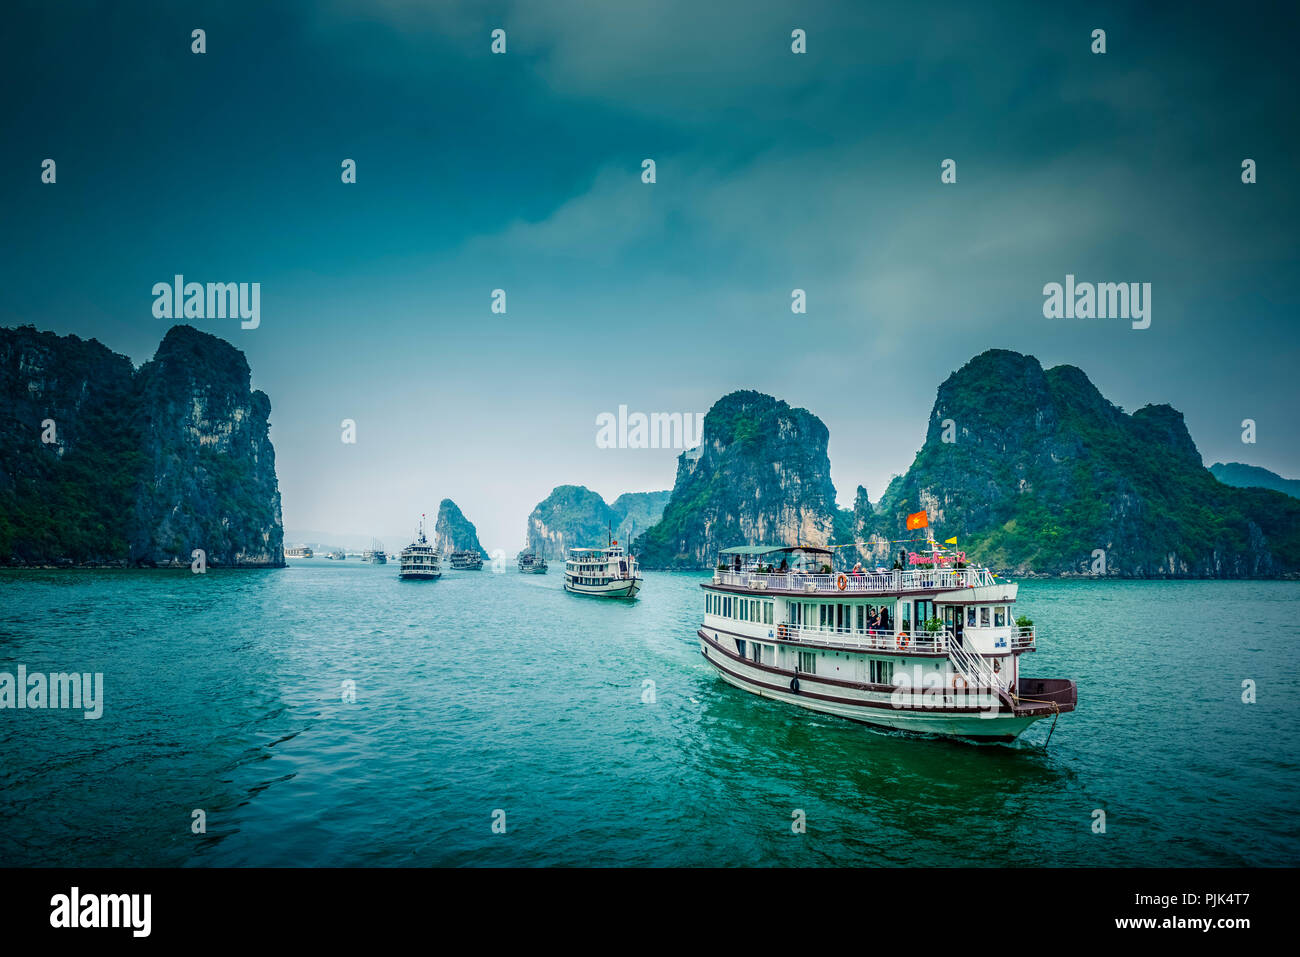 Asia, Vietnam, Quang Ninh province, Halong Bay Stock Photo